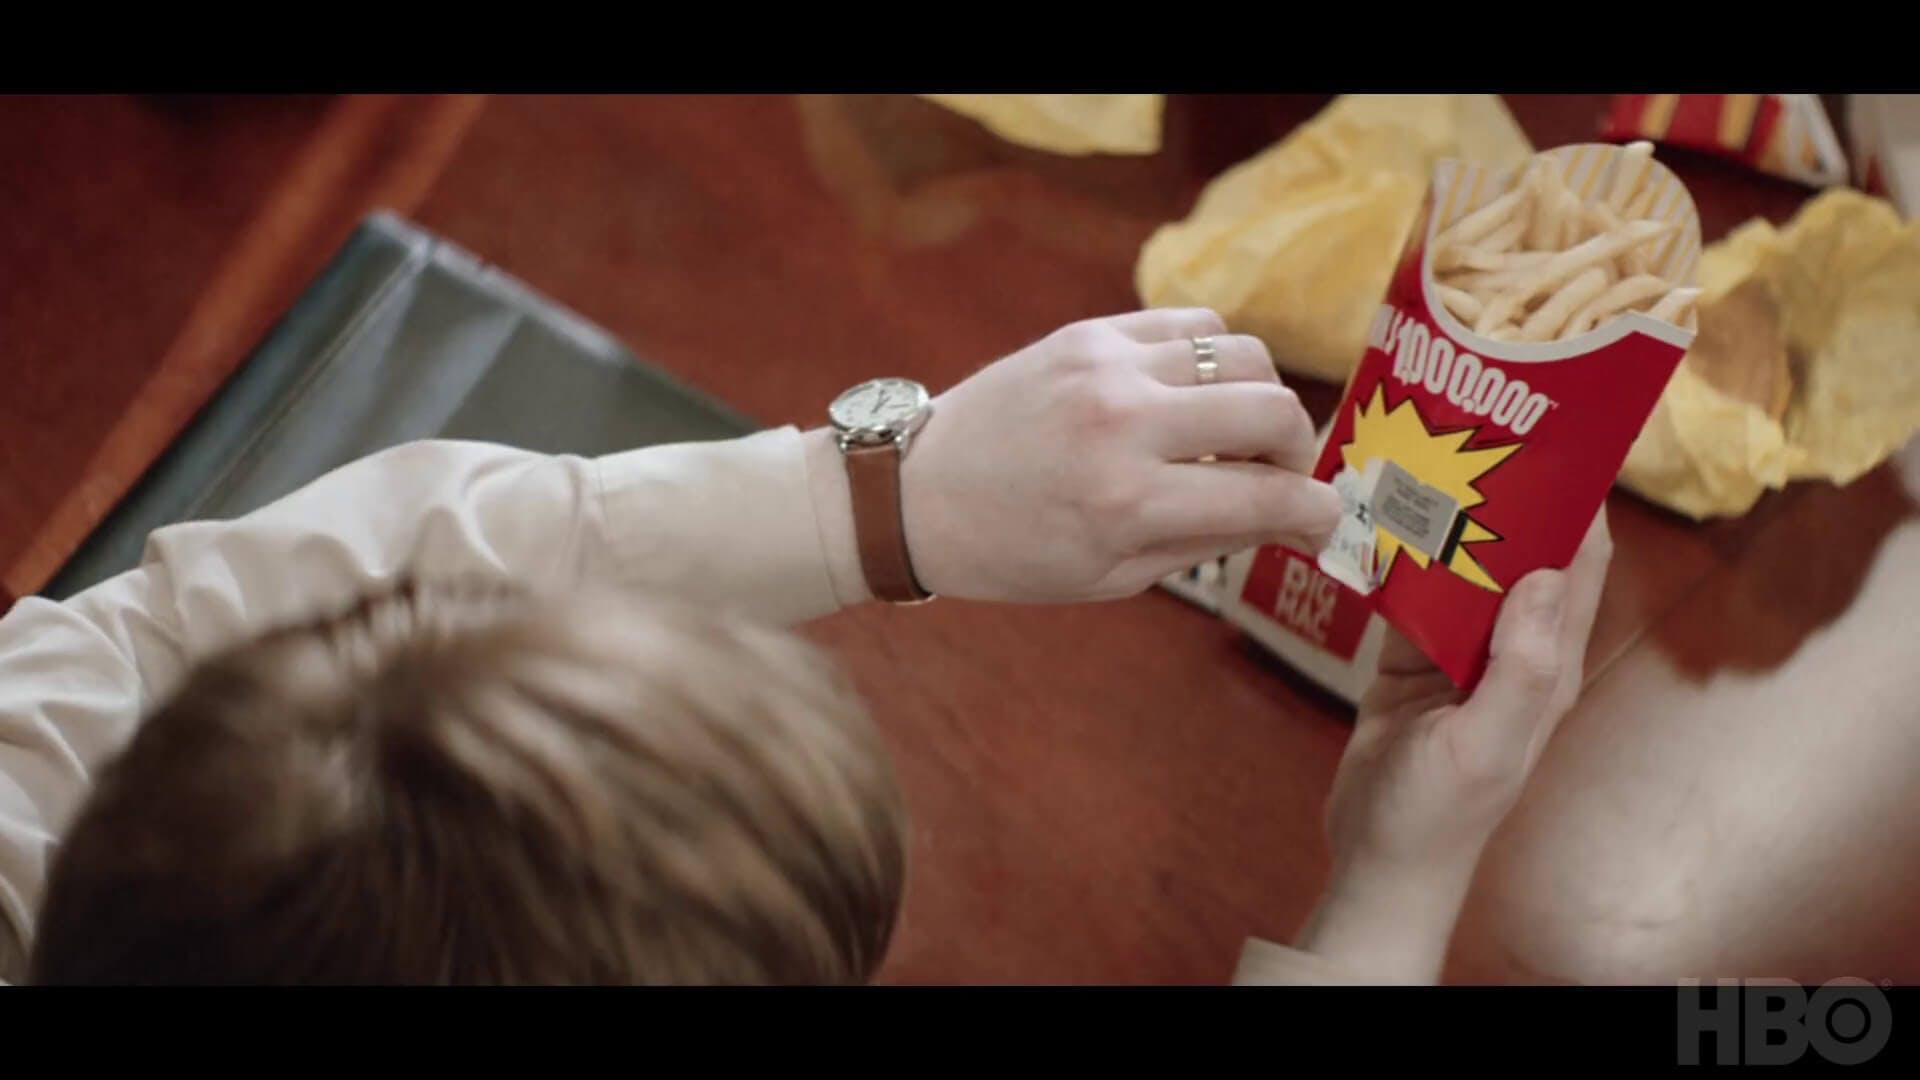 McDonalds docuseries